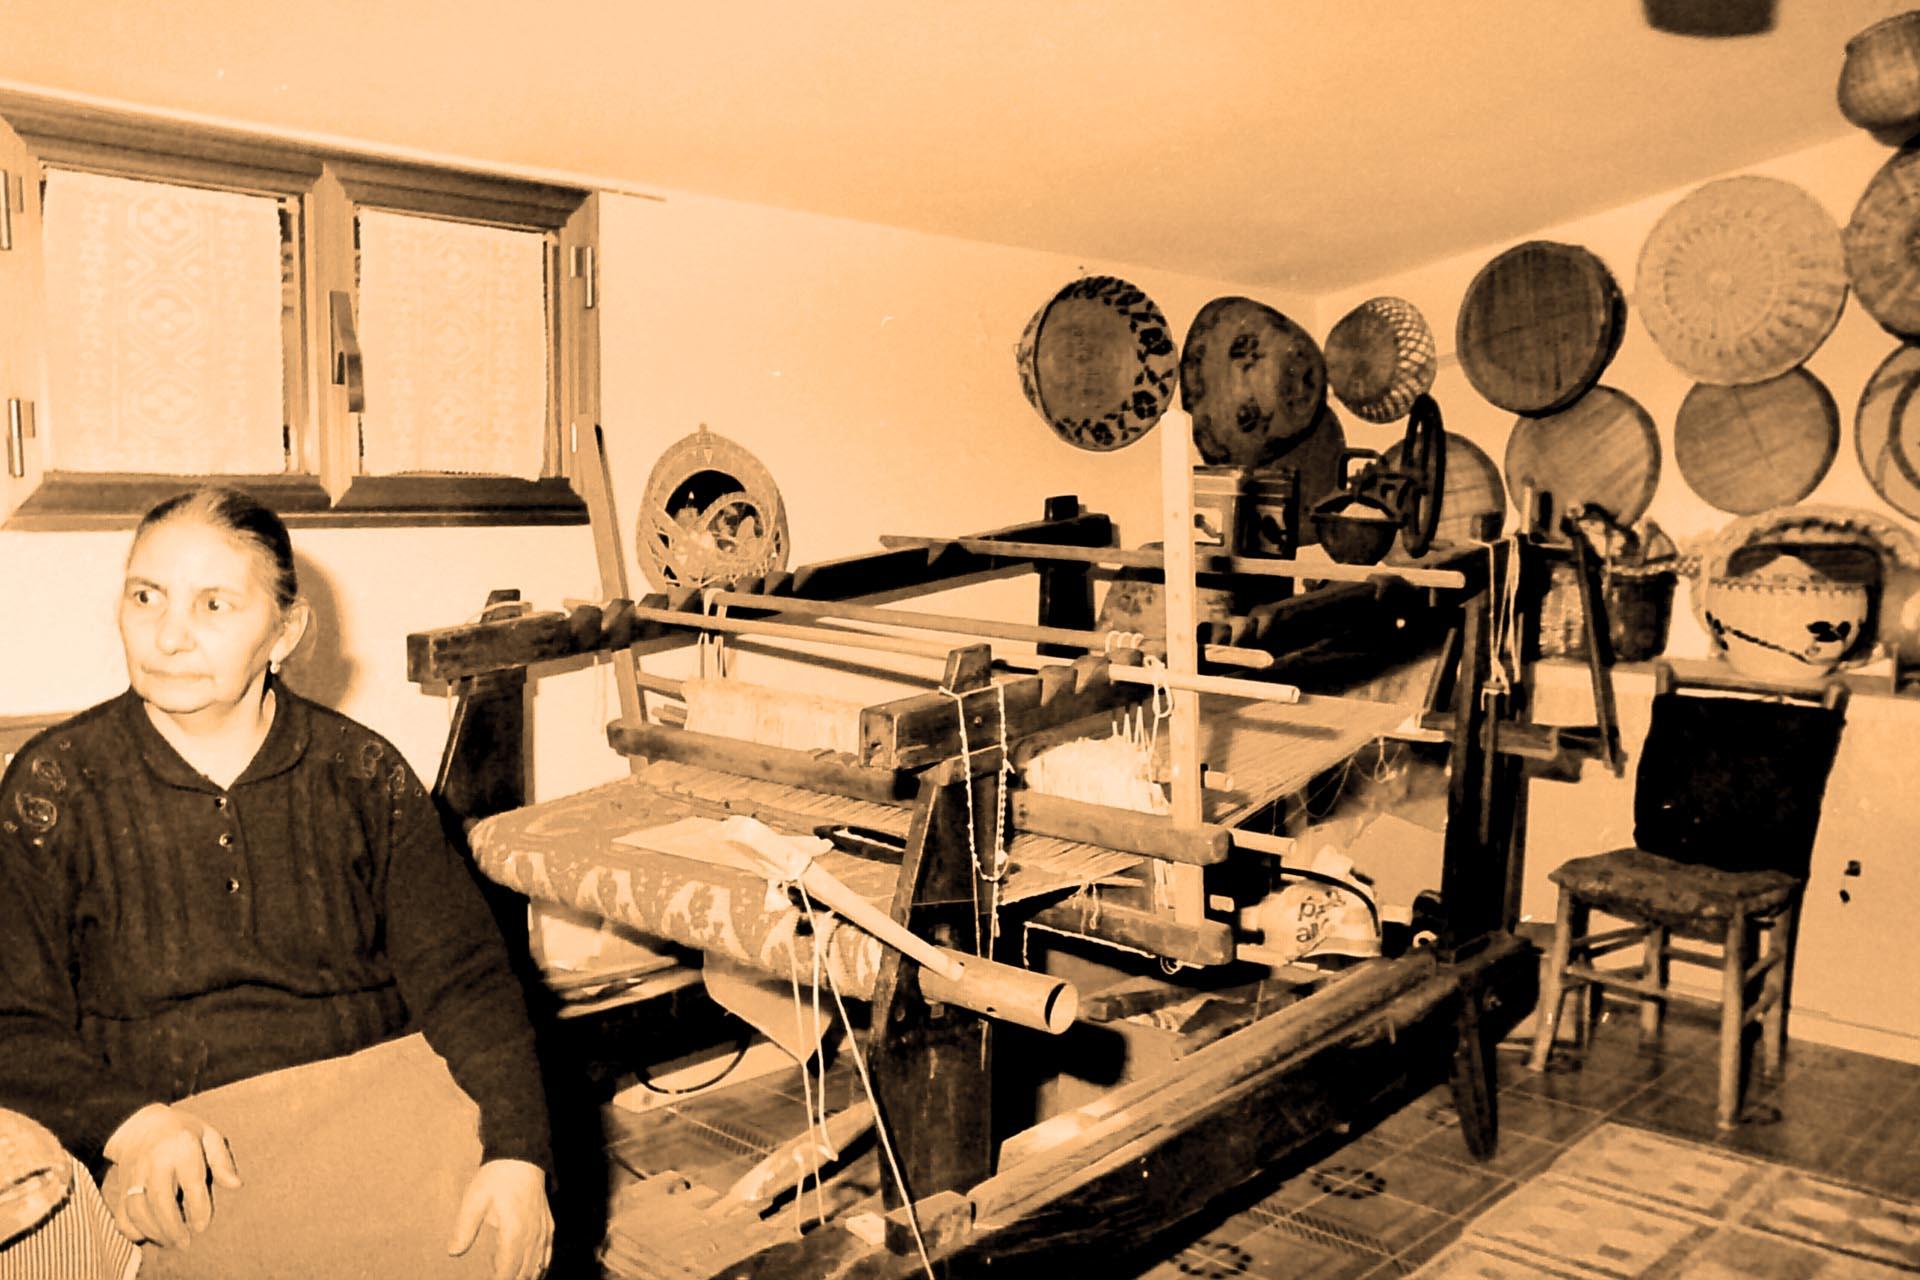 Tessitrice con antico telaio, Sardegna ,Arti & Mestieri 2001-'02